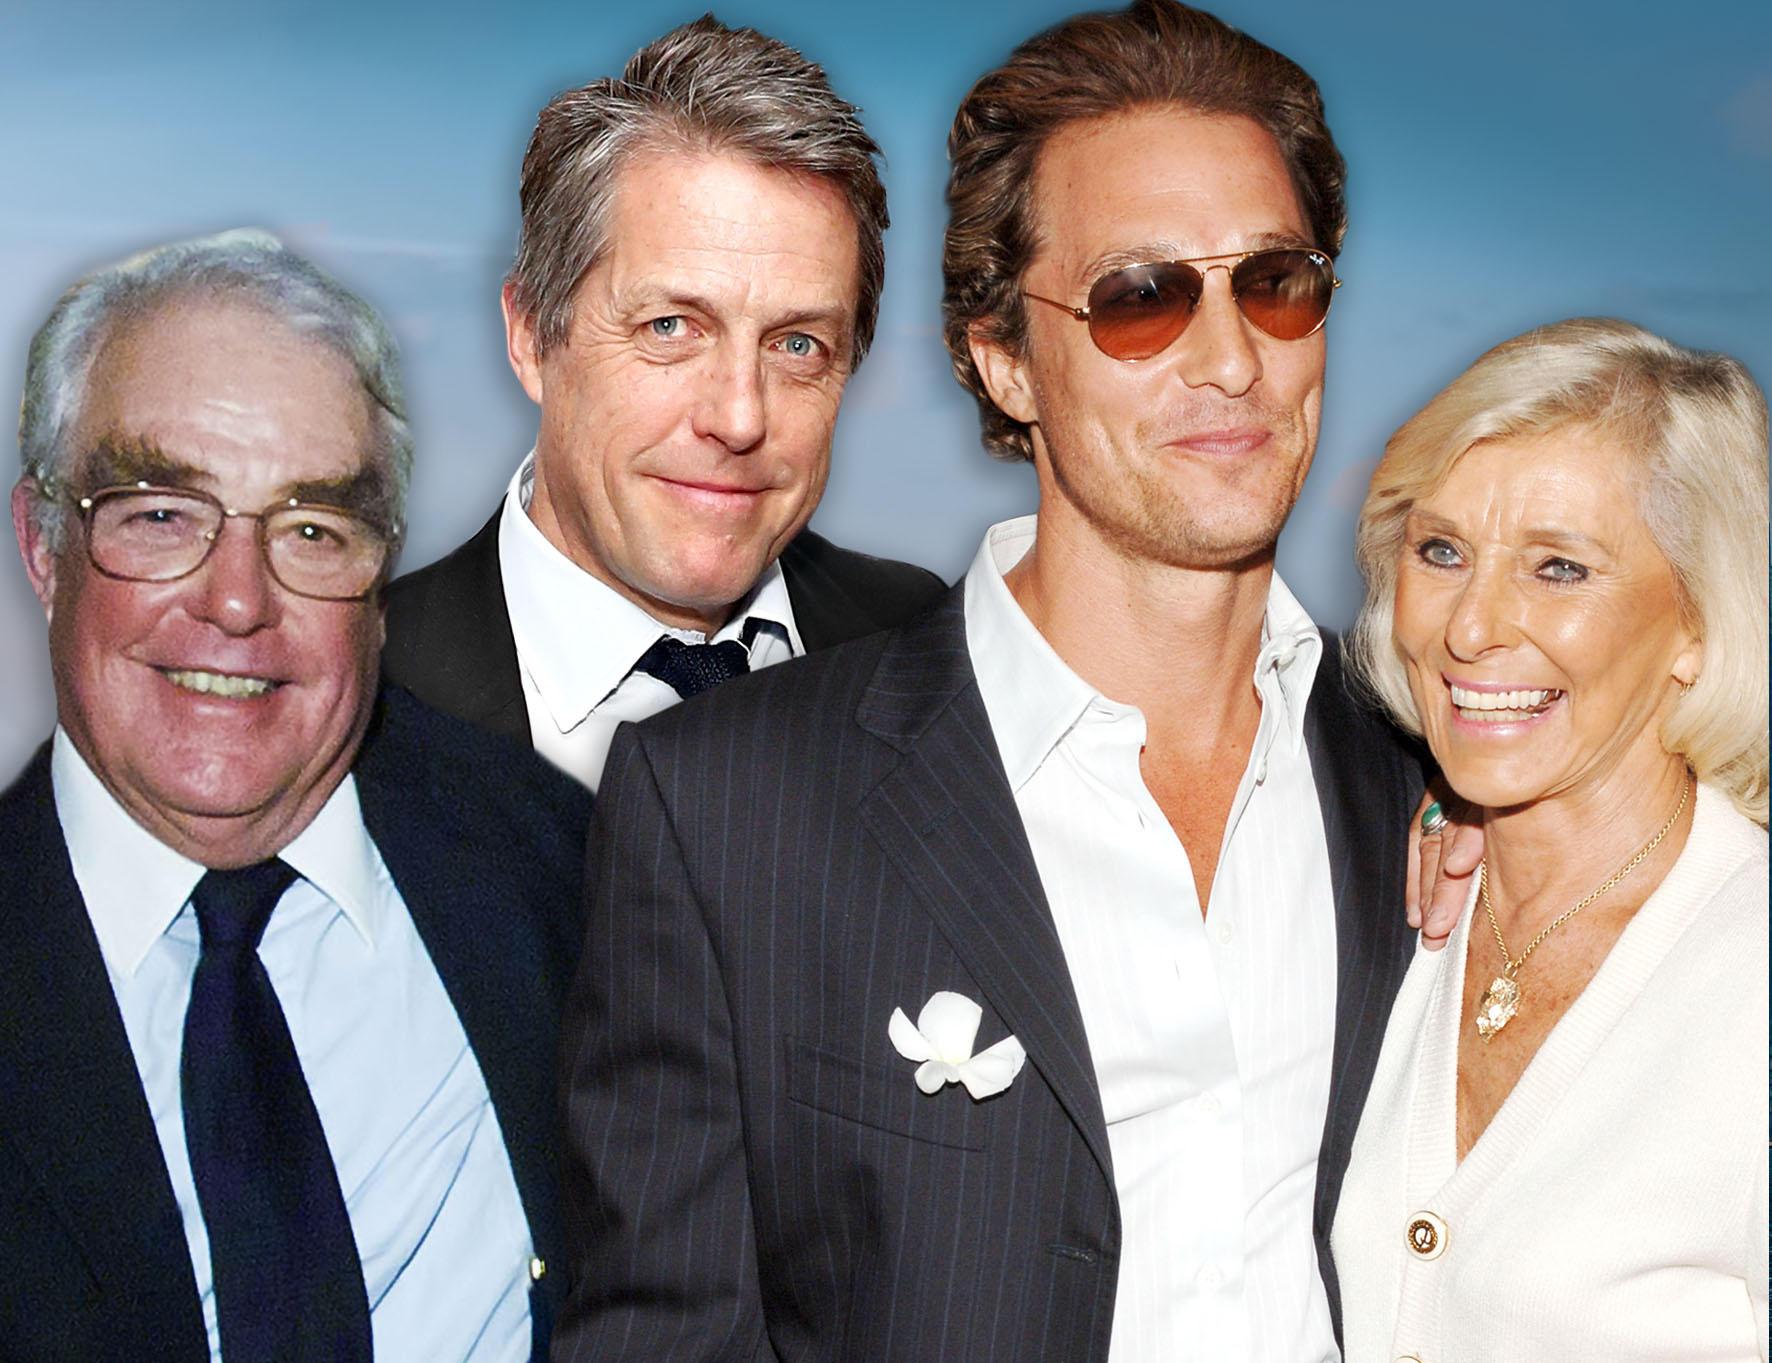 James Grant, Hugh Grant, Matthew McConaughey, Kay McConaughey